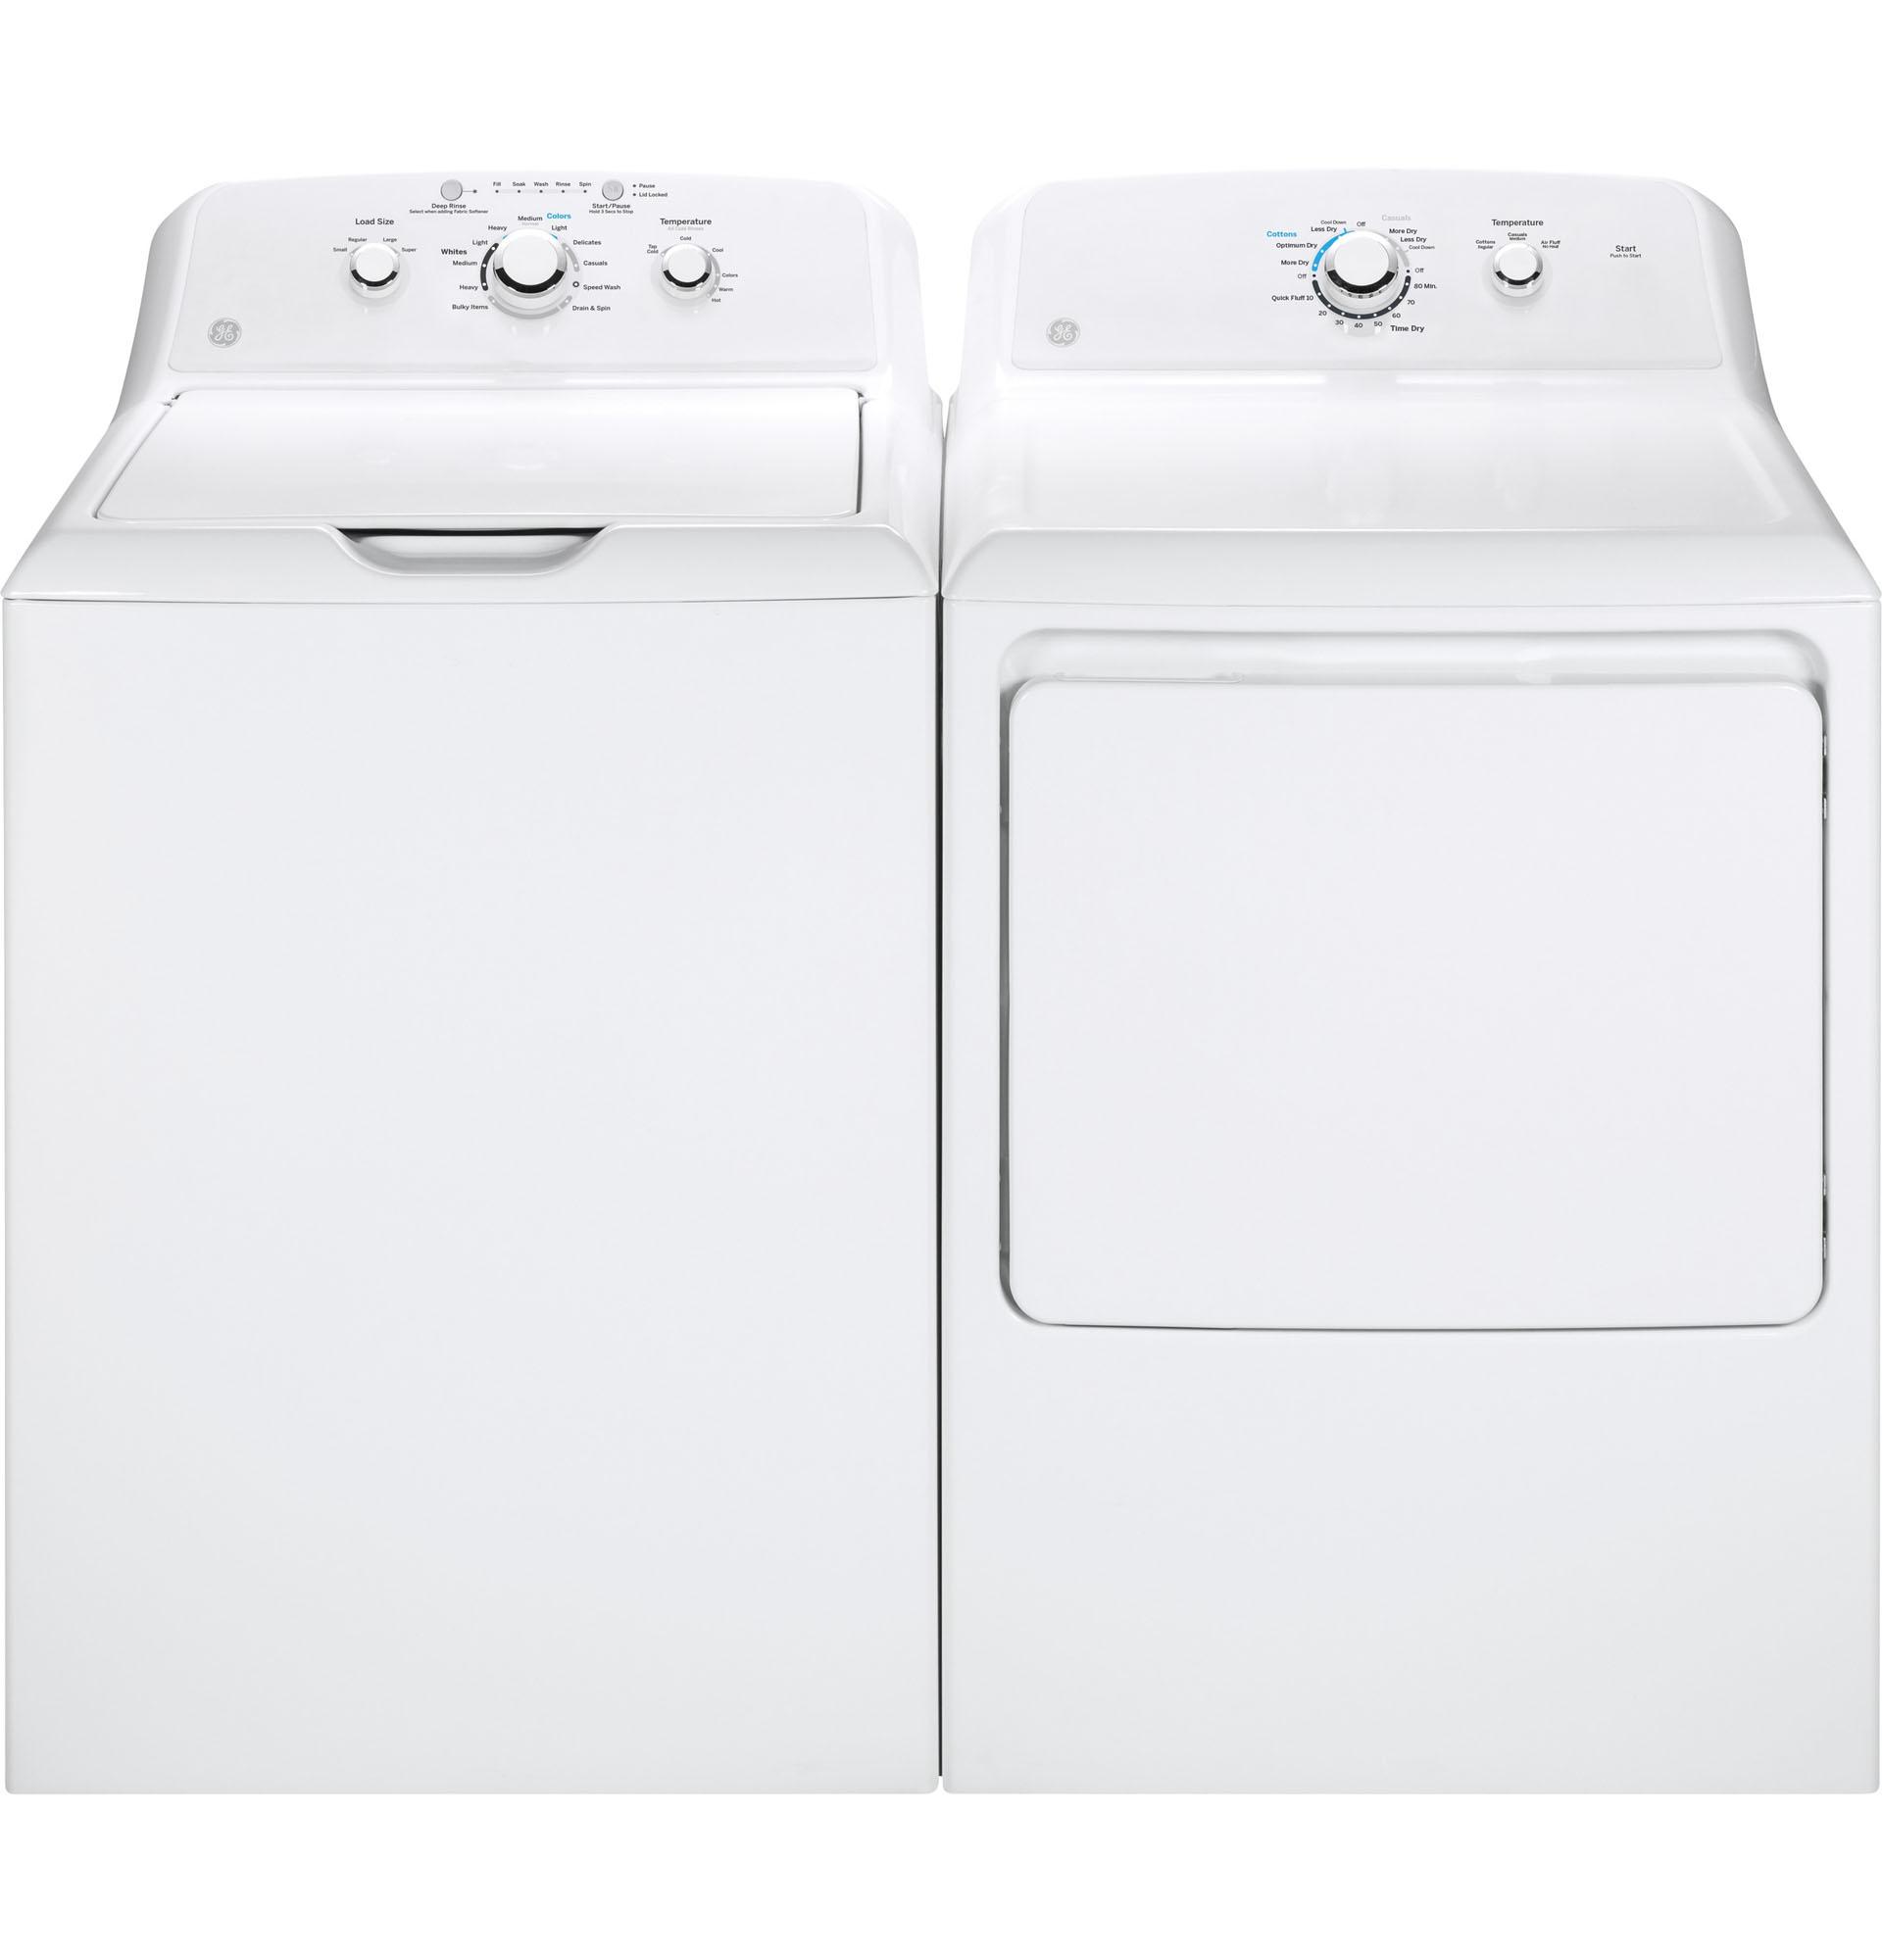 GE Appliances GTX33EASKWW 6.2 cu. ft. Electric Dryer - White